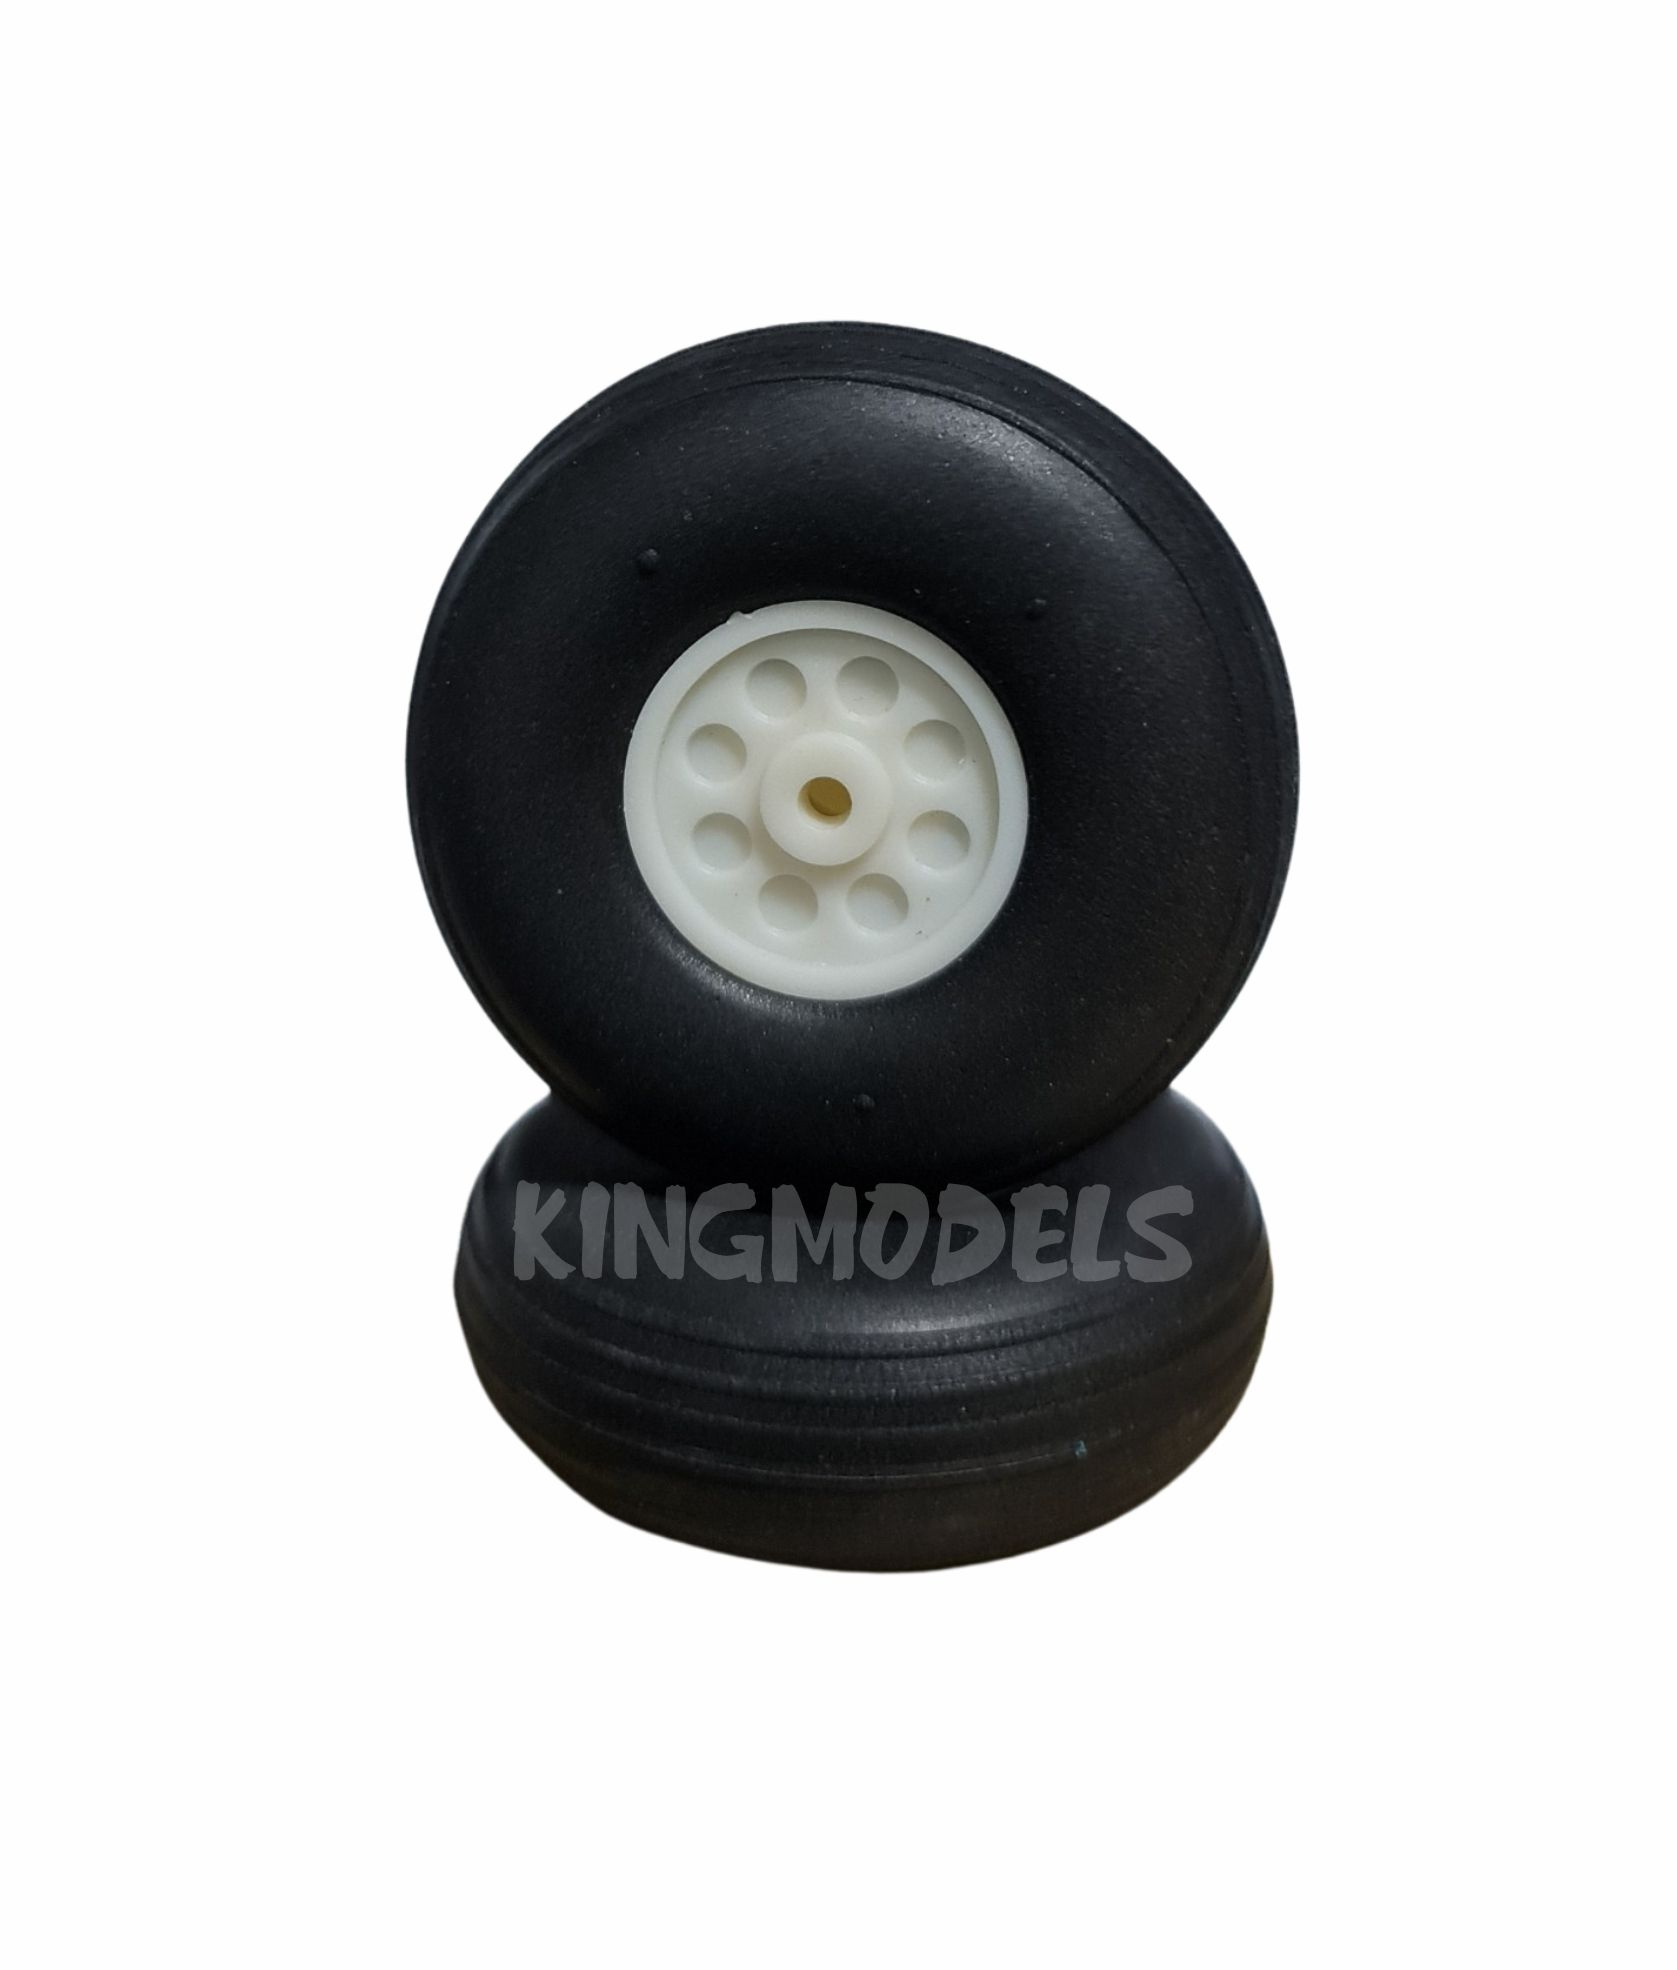 Roda De Borracha Extra-leve E Cubo Nylon- 63mm - (2pçs)  - King Models